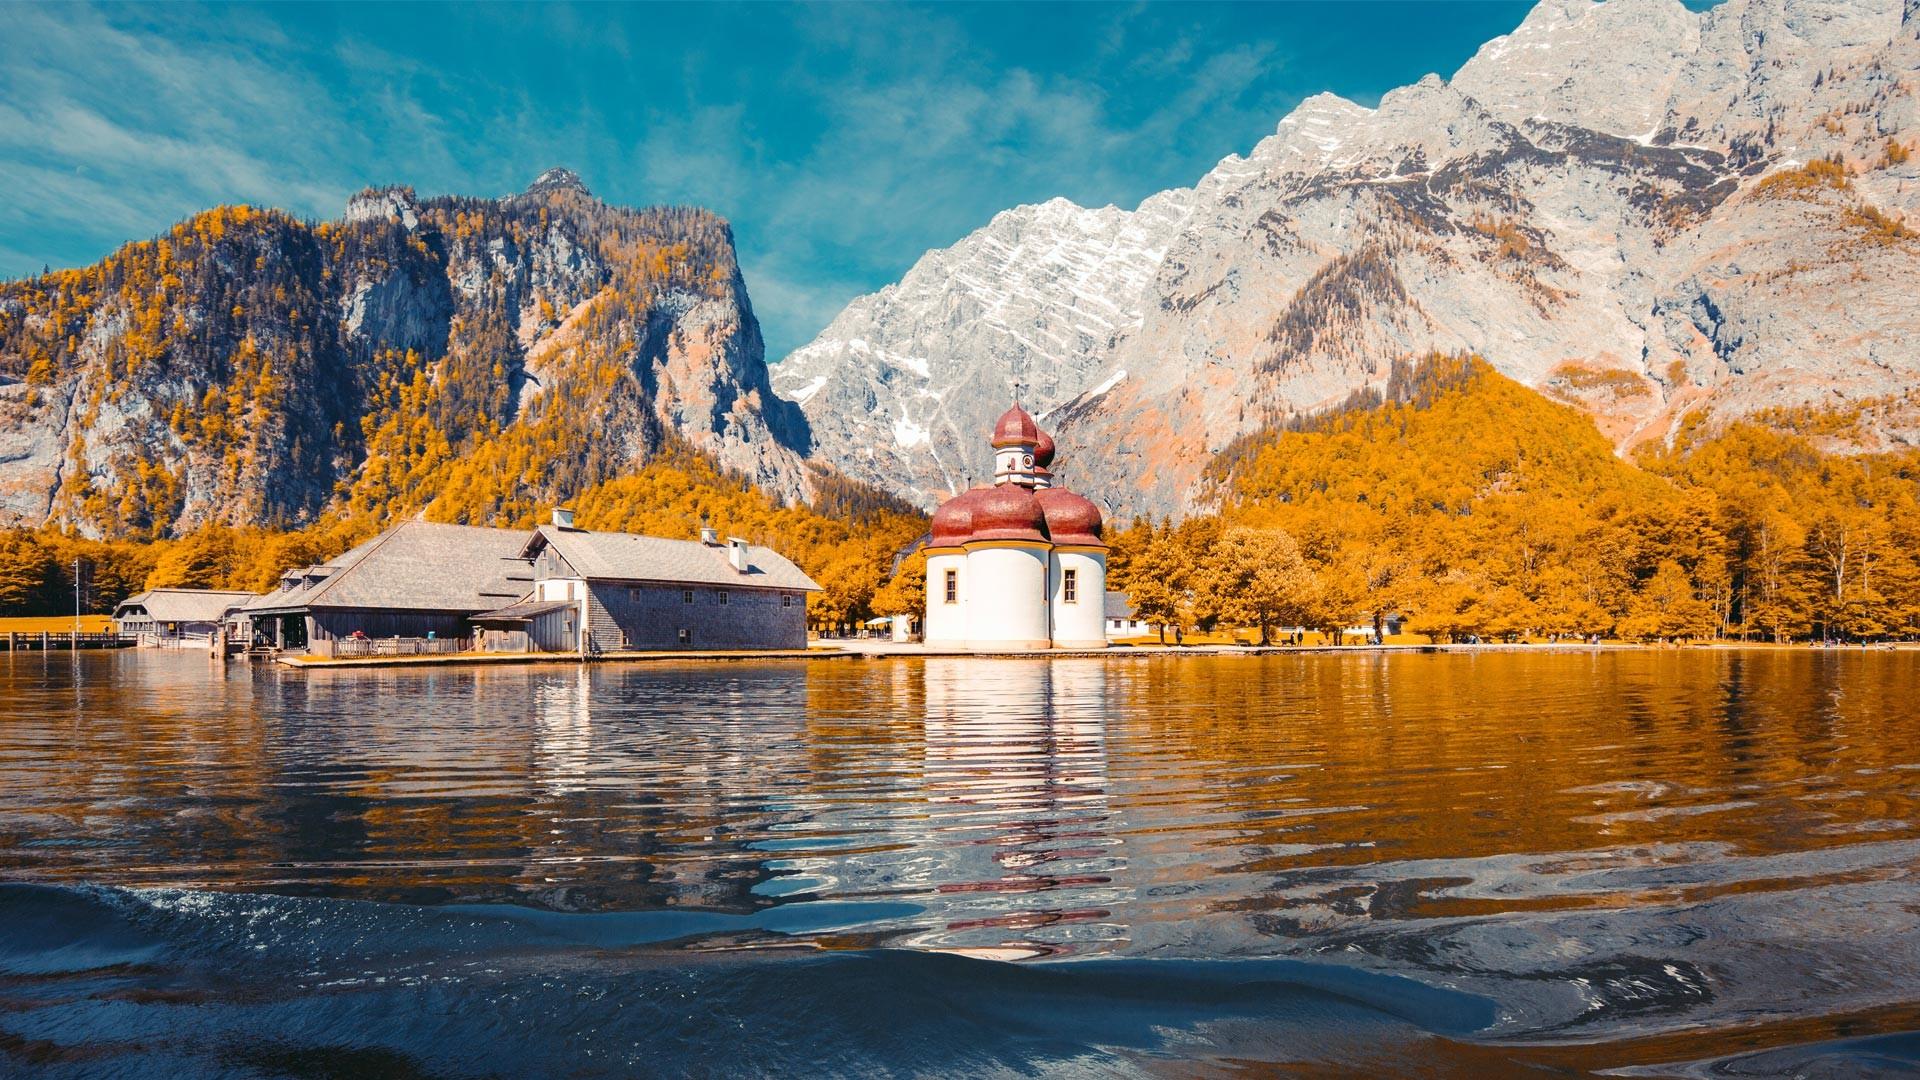 Herbst in Berchtesgaden - Königssee